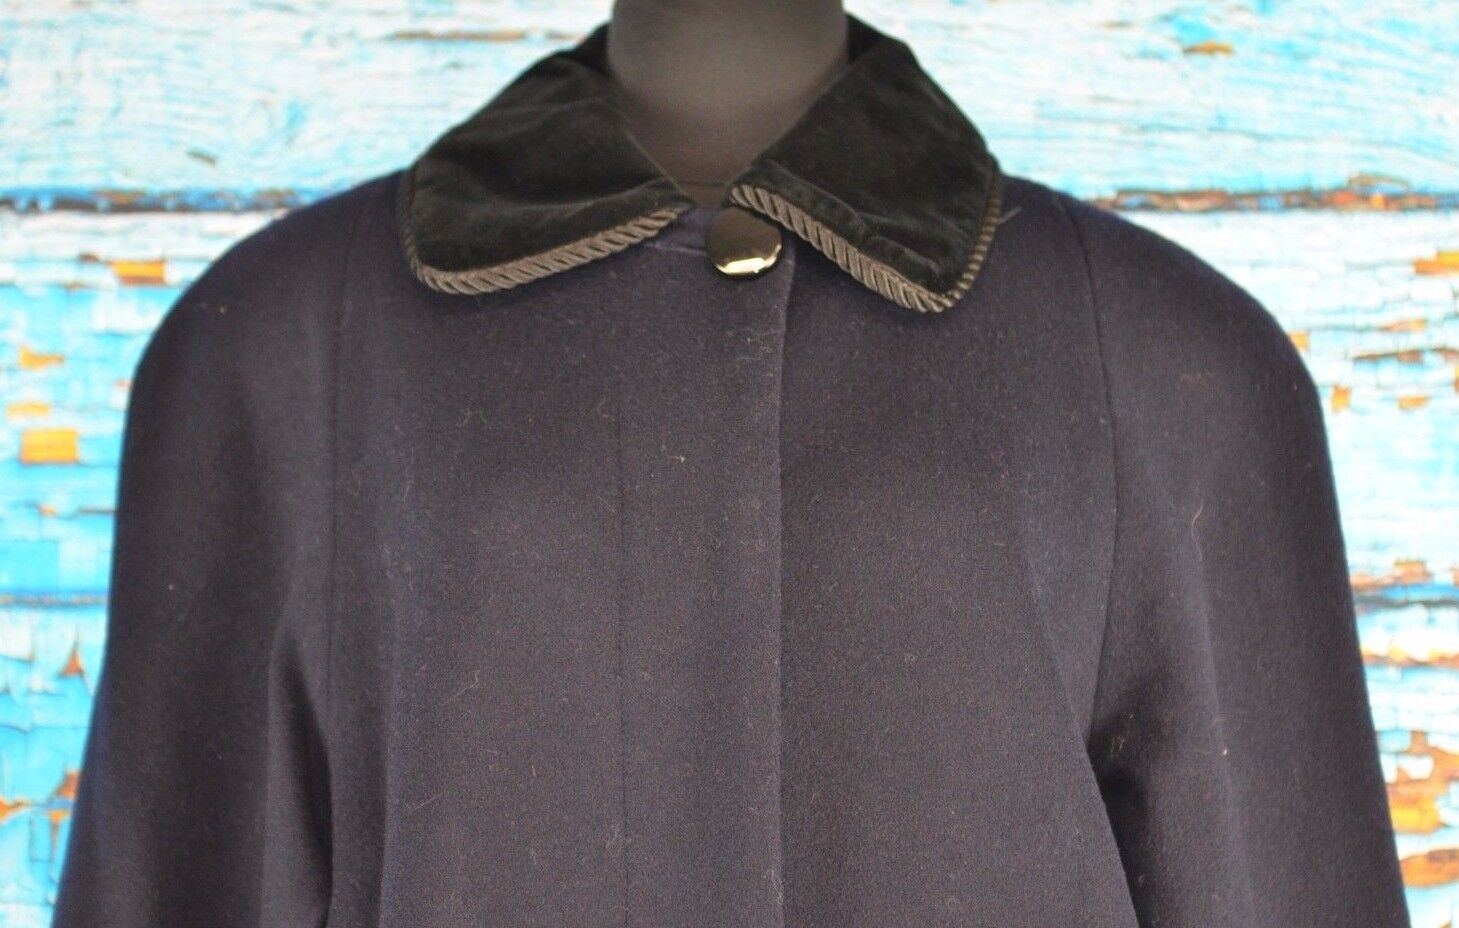 Halston Women's Overcoat Size 6 Wool USA Warm NEW  Coat Winter